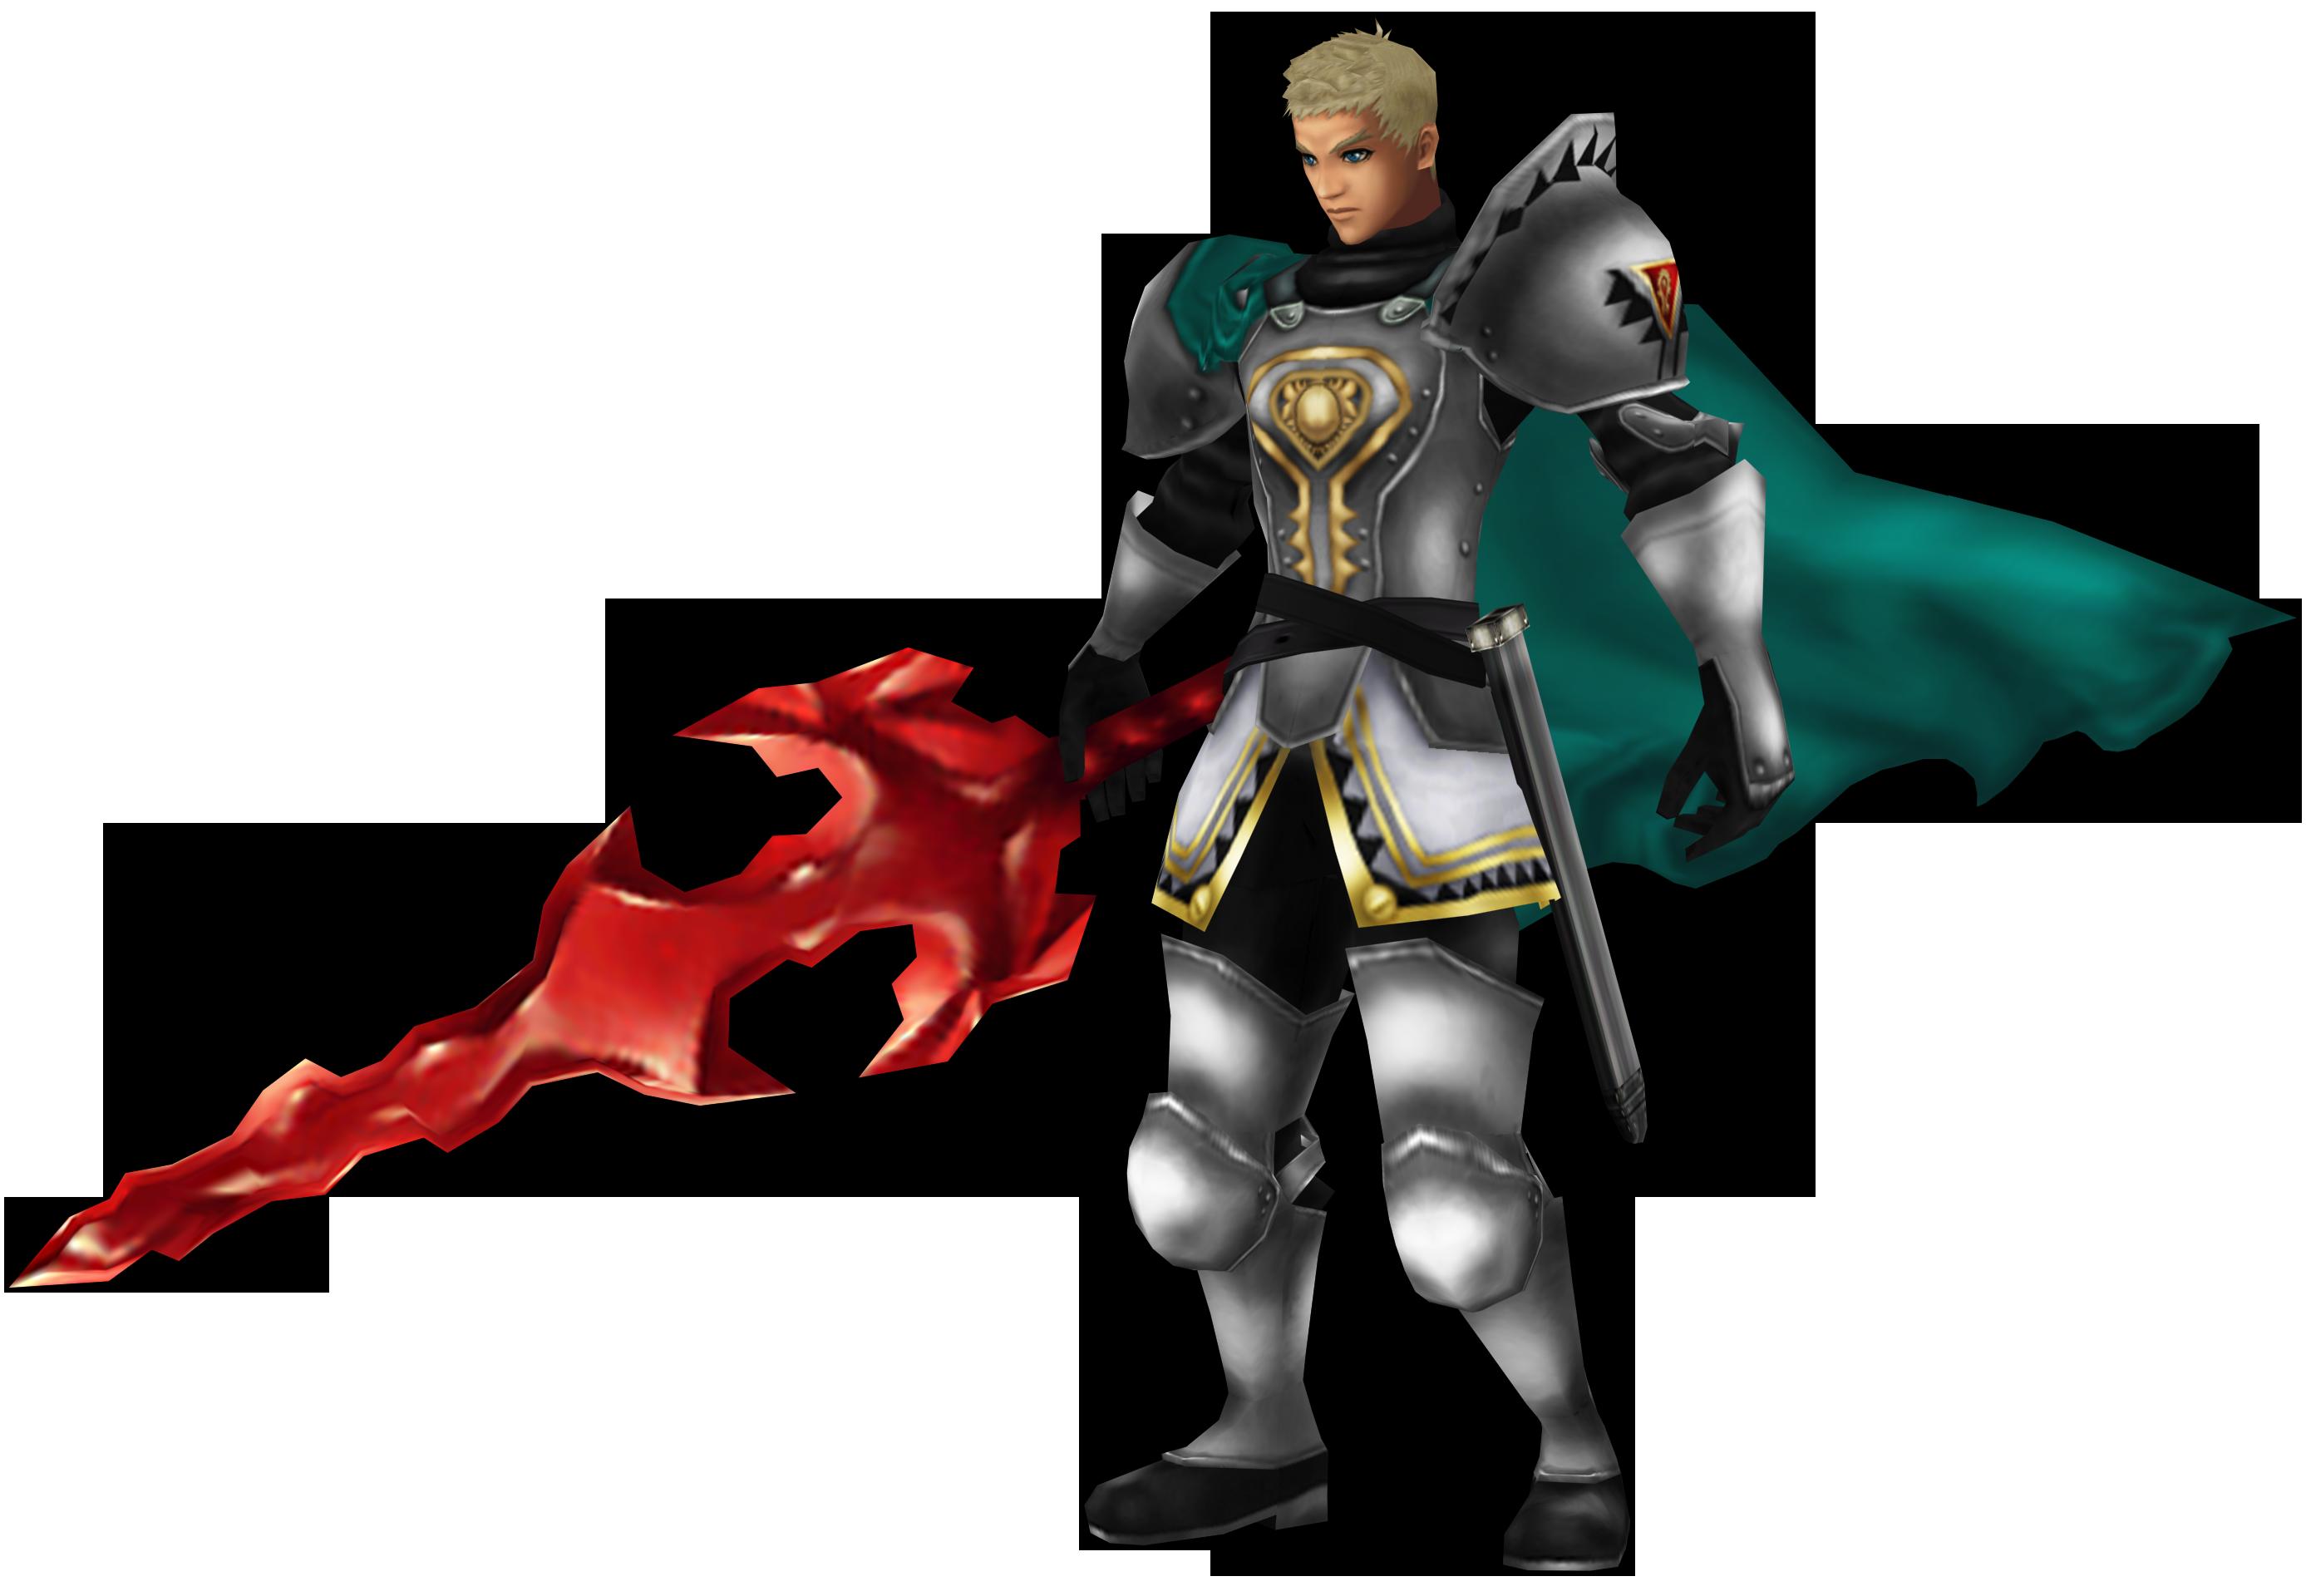 Chrono Cross HD: Dario, the Masamune fencer. by 2PlayerWins